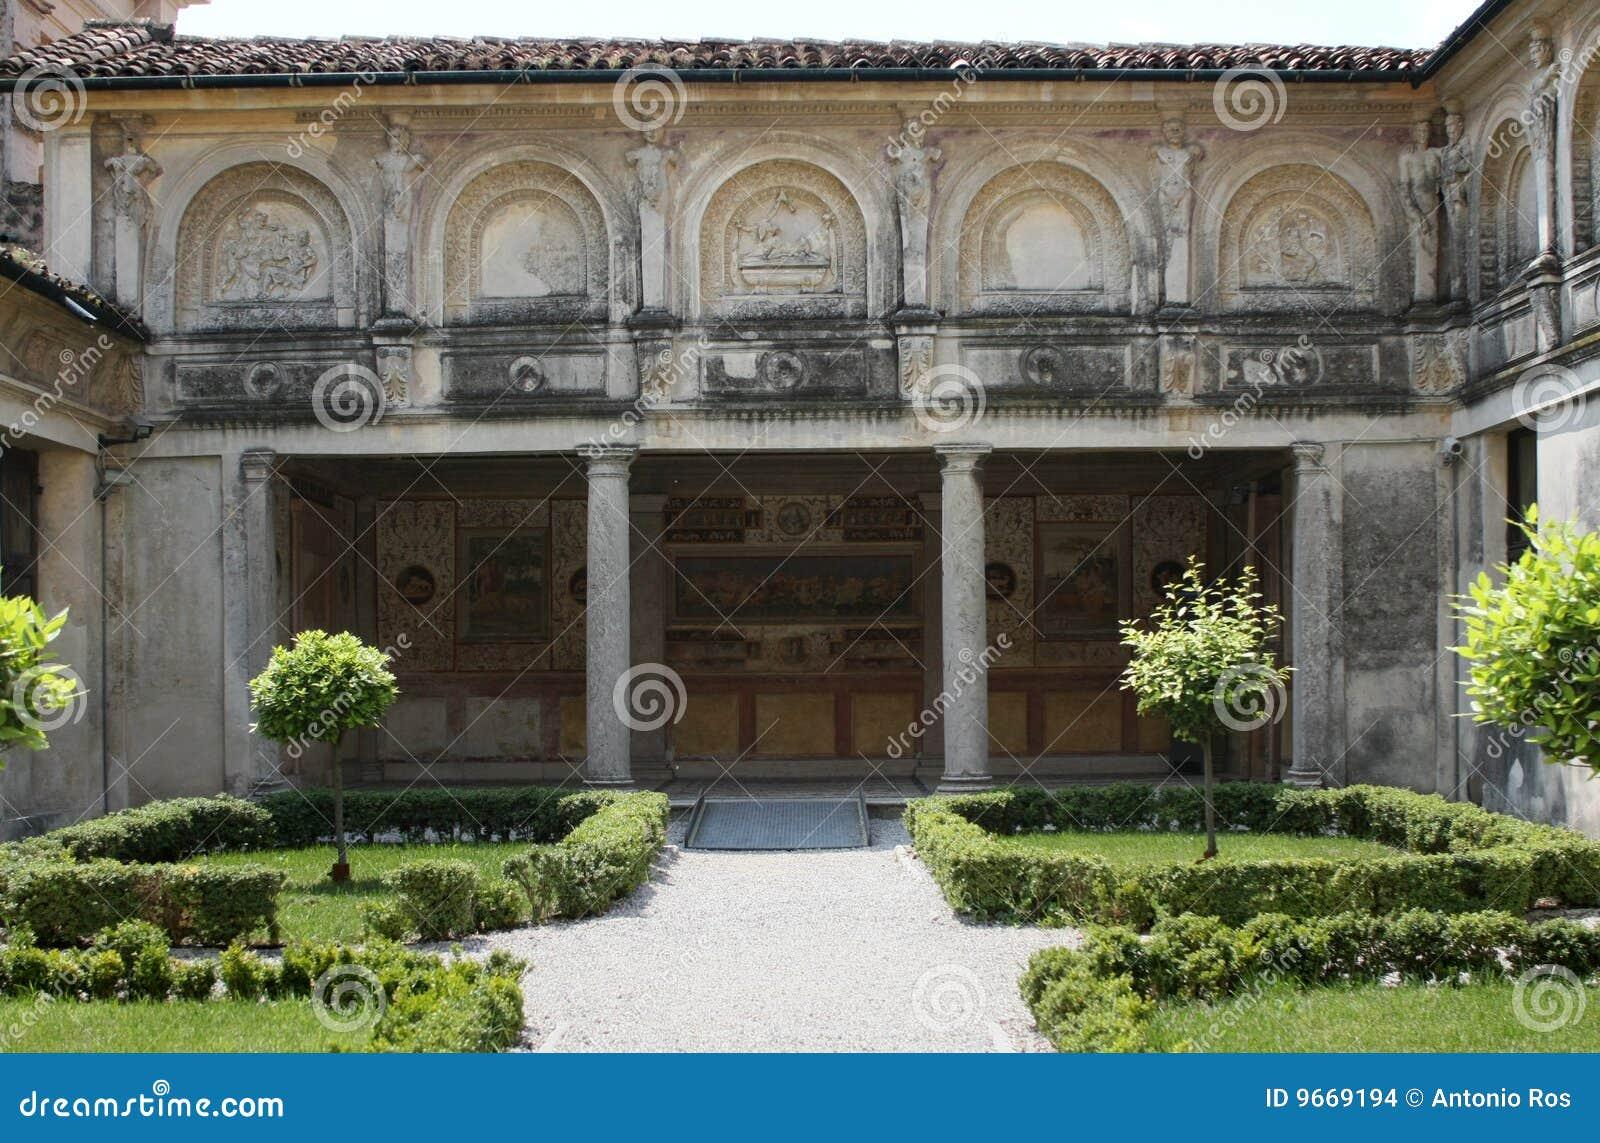 Palazzo te mantova italia il giardino segreto - Giardino del te ...